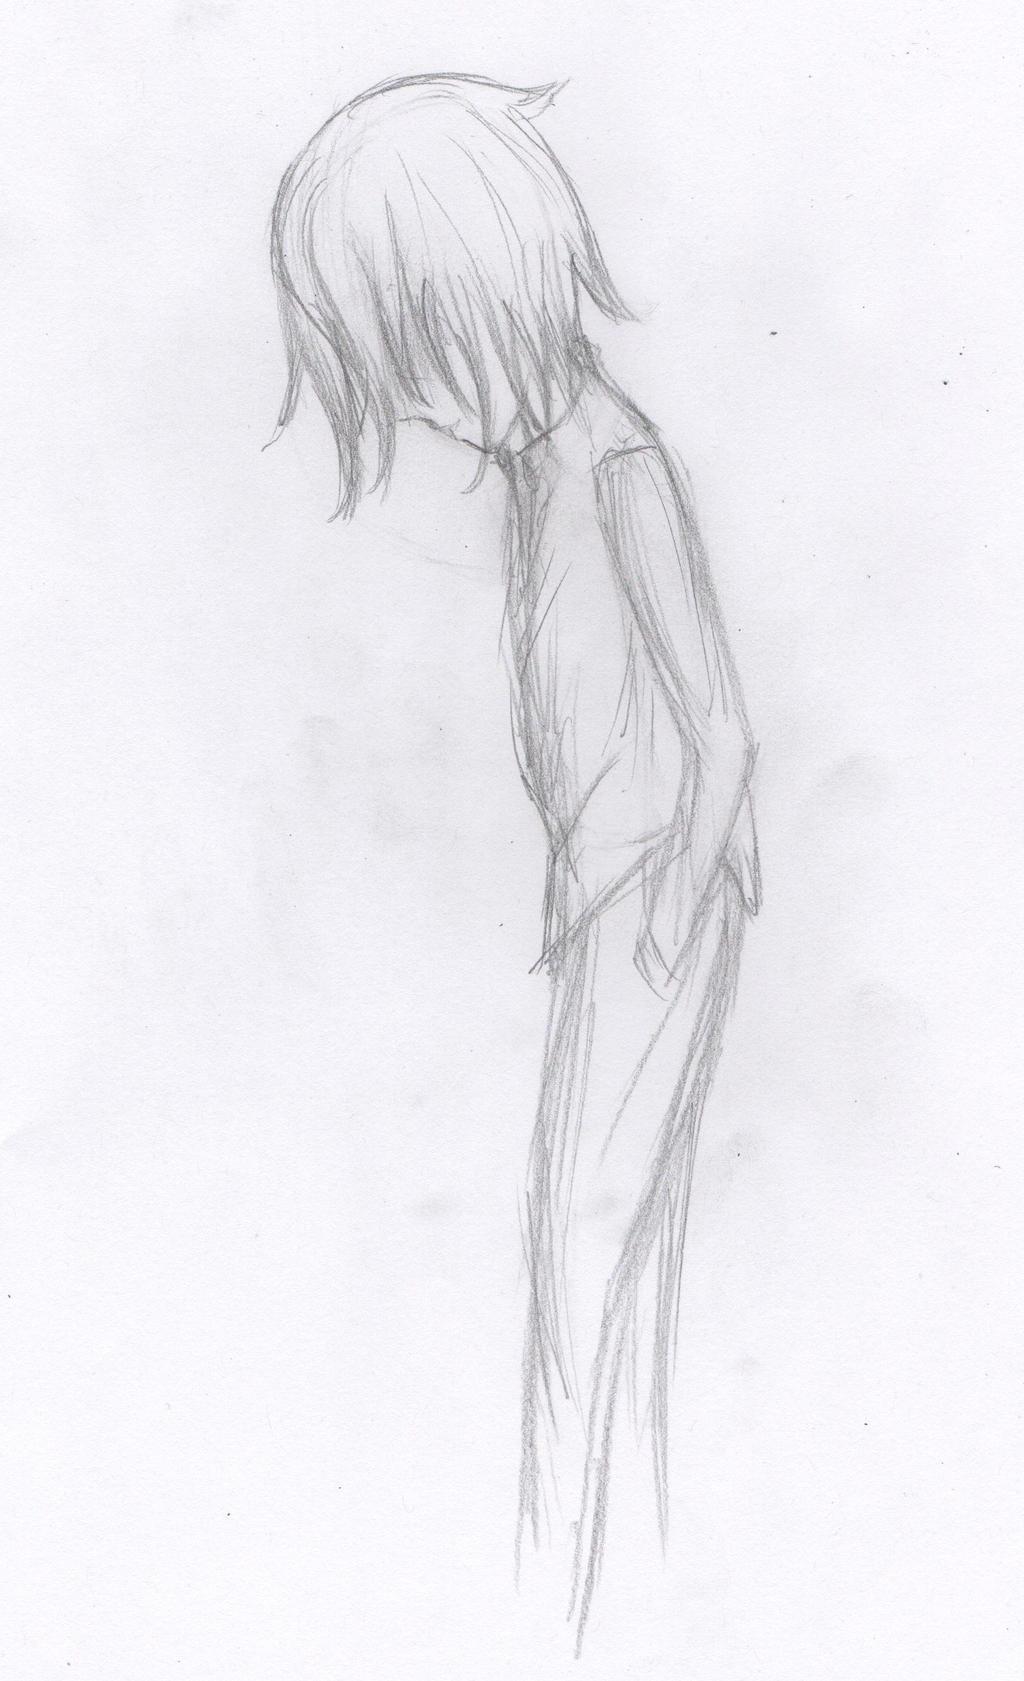 Sad Anime Boy by anapis512 on DeviantArt